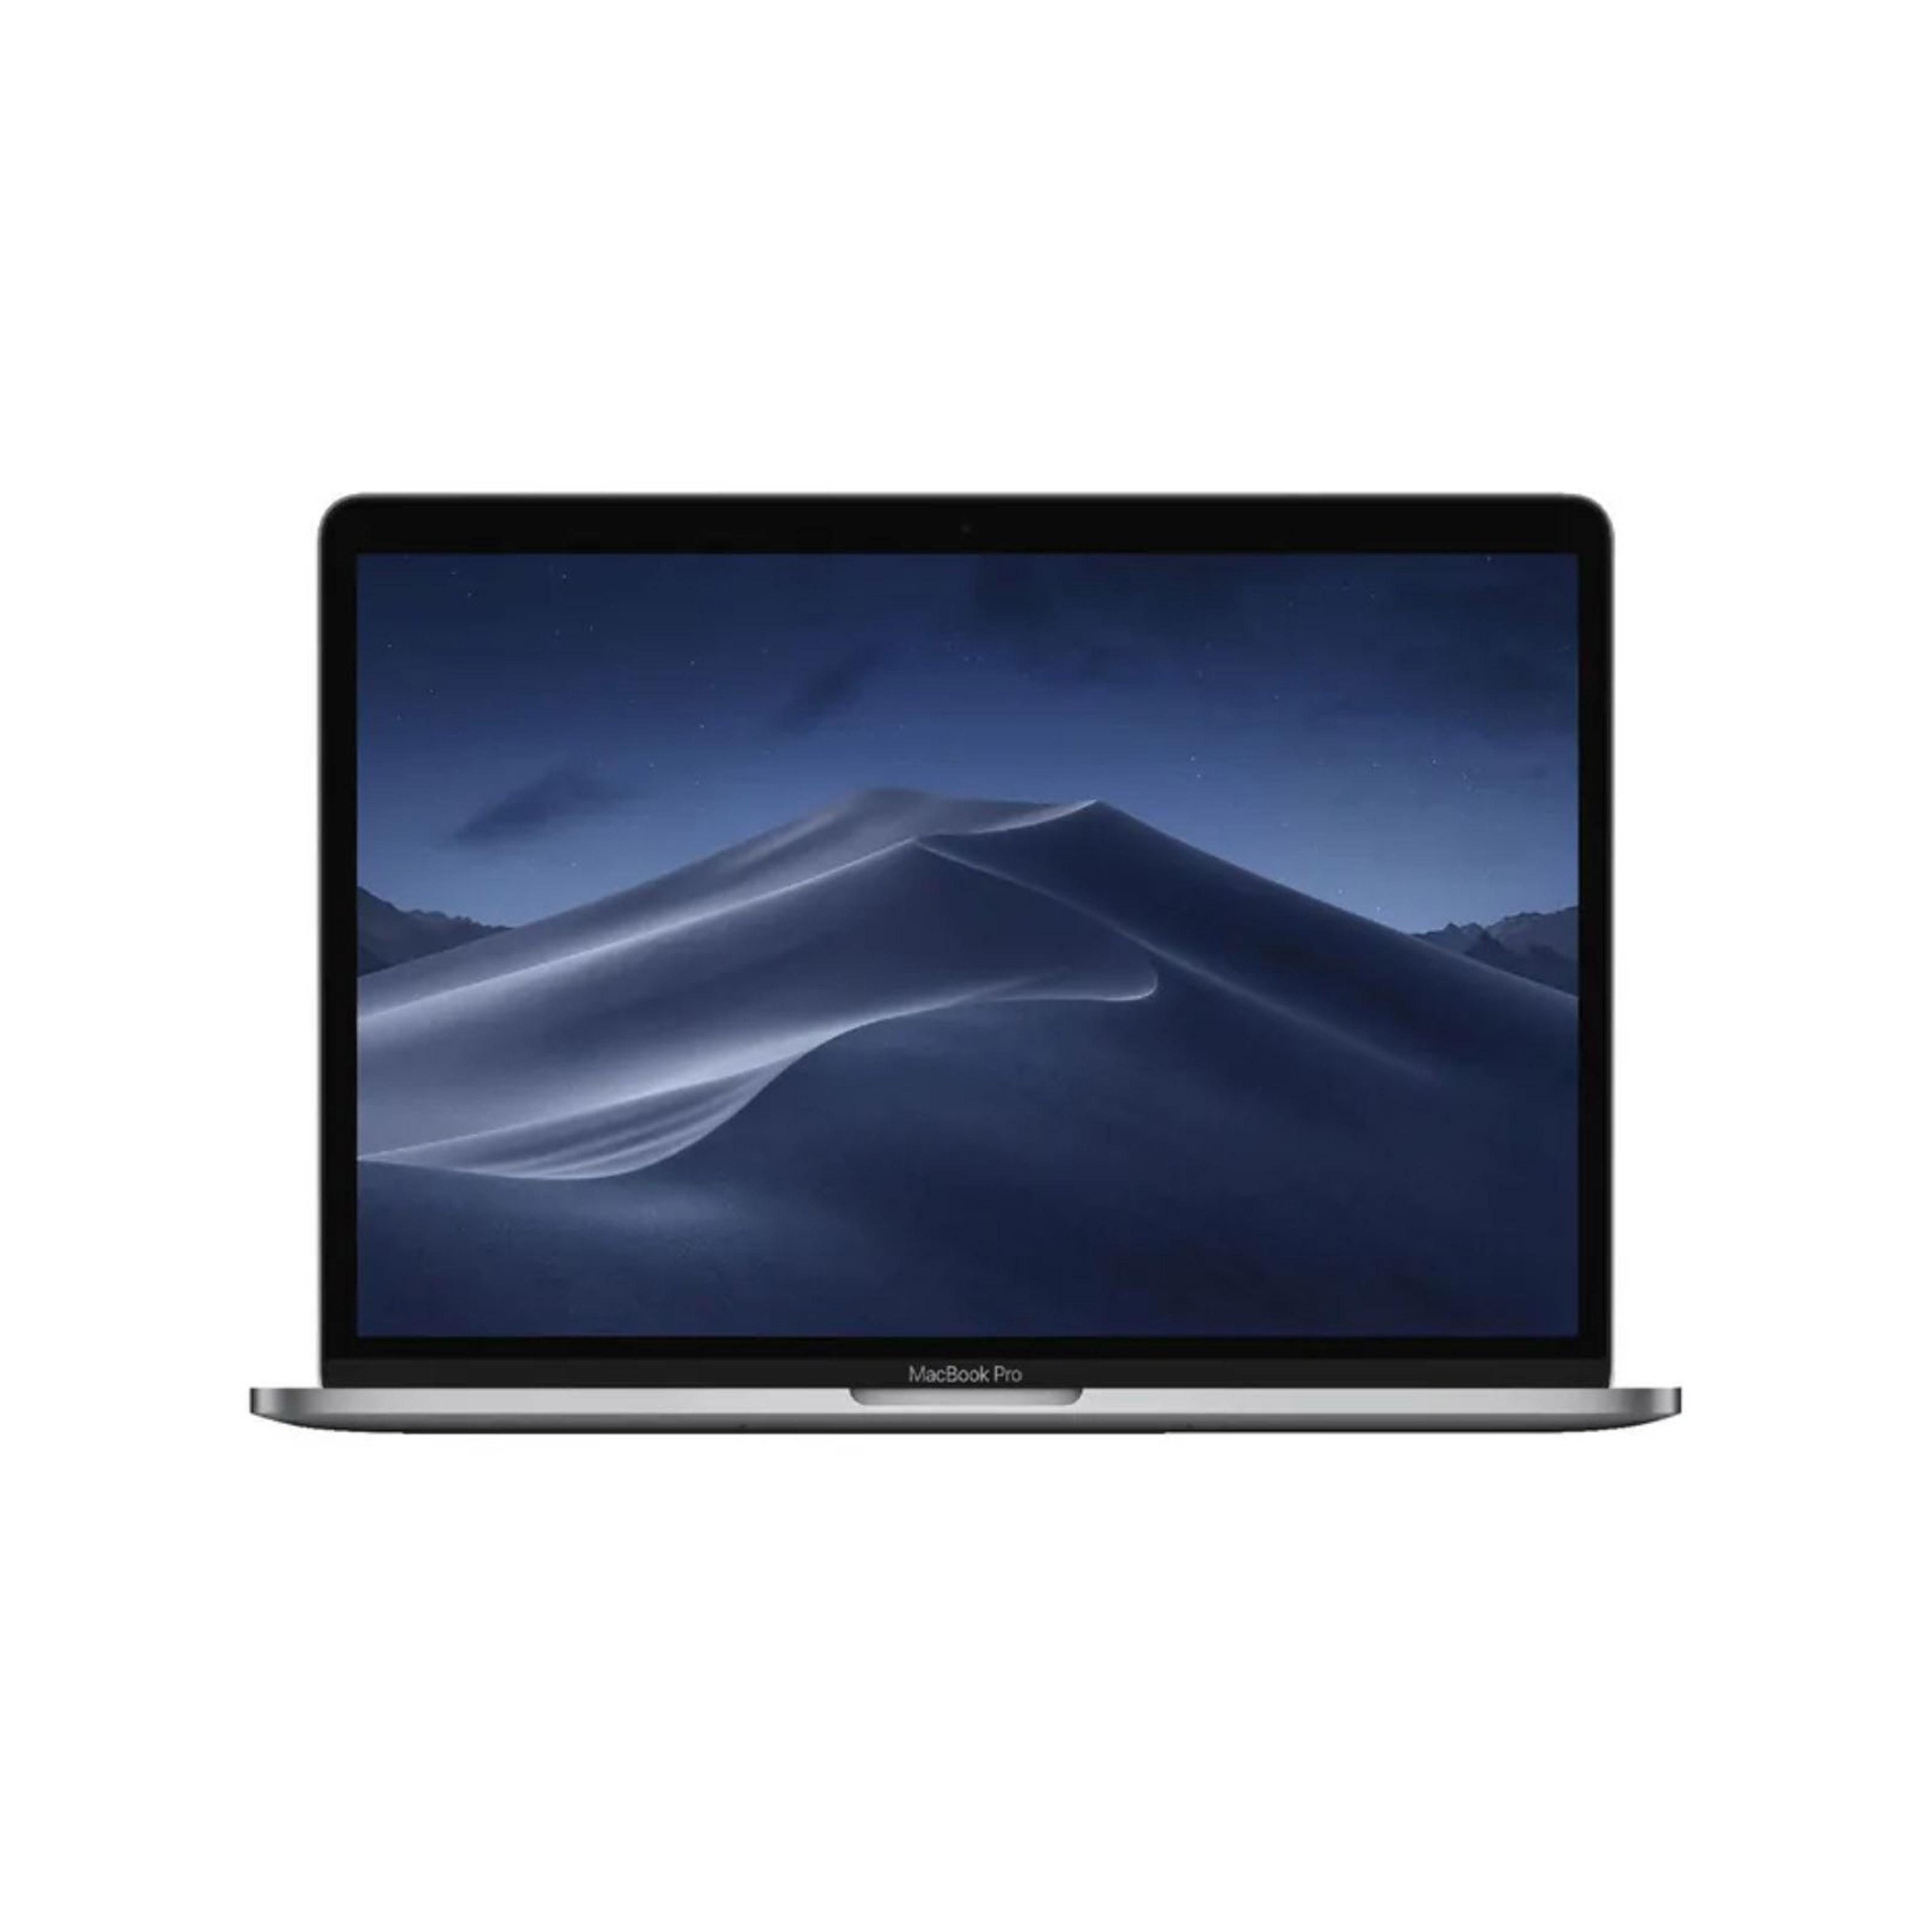 Apple 13in MacBook Pro 2019 - 2.4GHz 8th Gen Intel i5 512GB - Space Grey (MV972X/A)